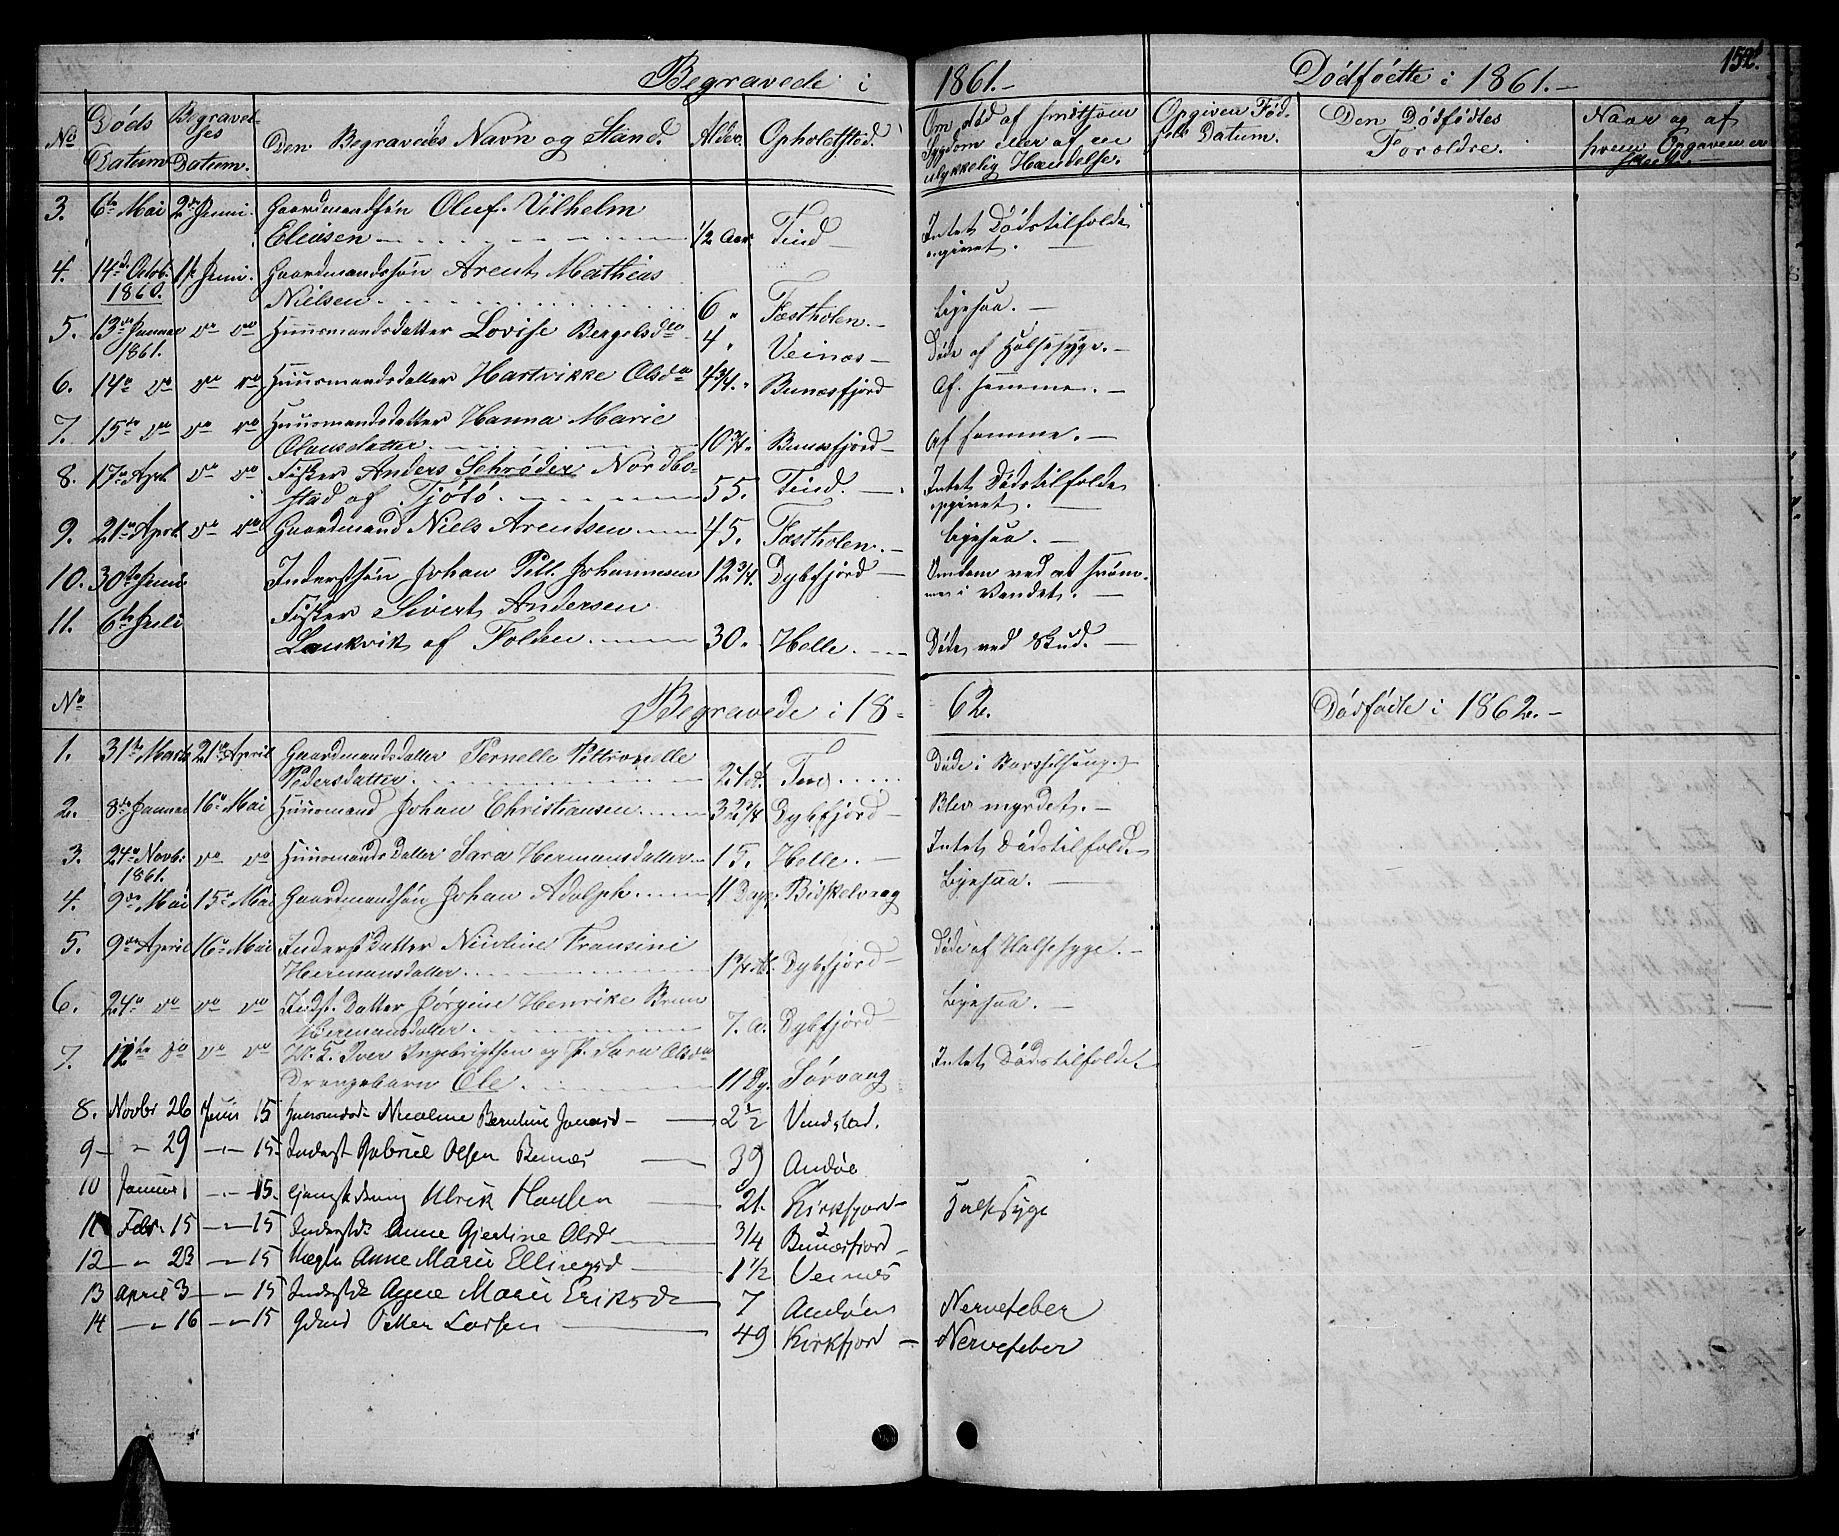 SAT, Ministerialprotokoller, klokkerbøker og fødselsregistre - Nordland, 886/L1224: Klokkerbok nr. 886C01, 1843-1873, s. 152